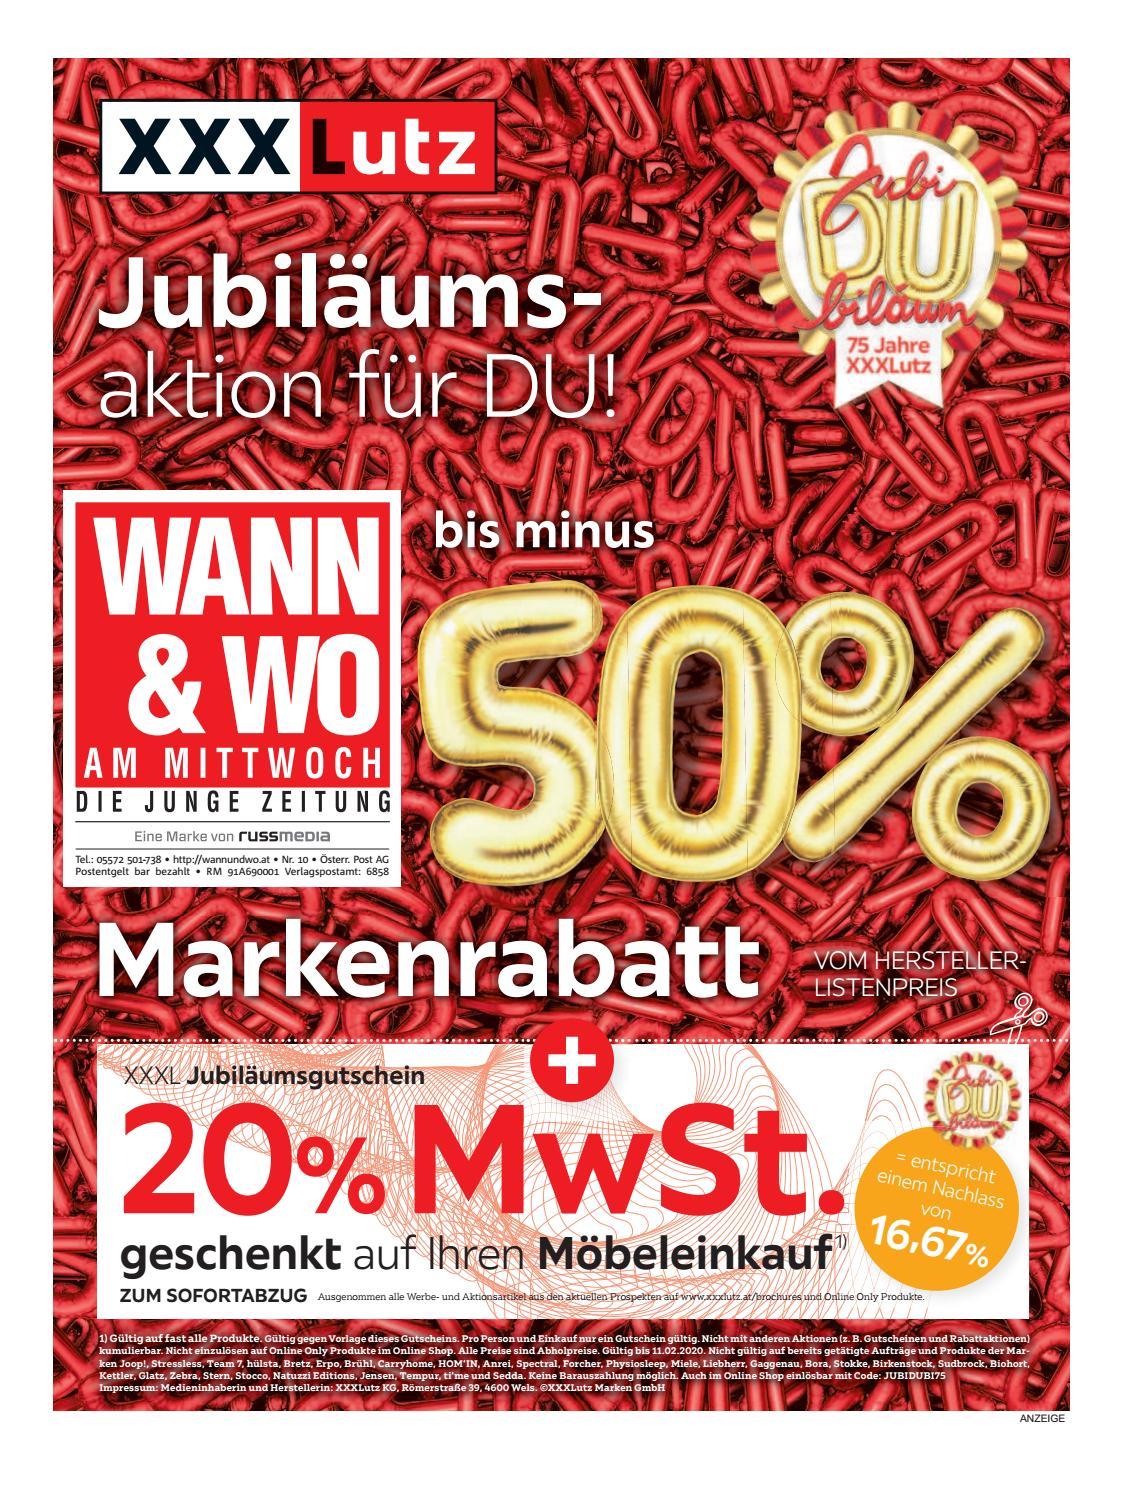 Matzen-raggendorf single kennenlernen Gschwandt dating app